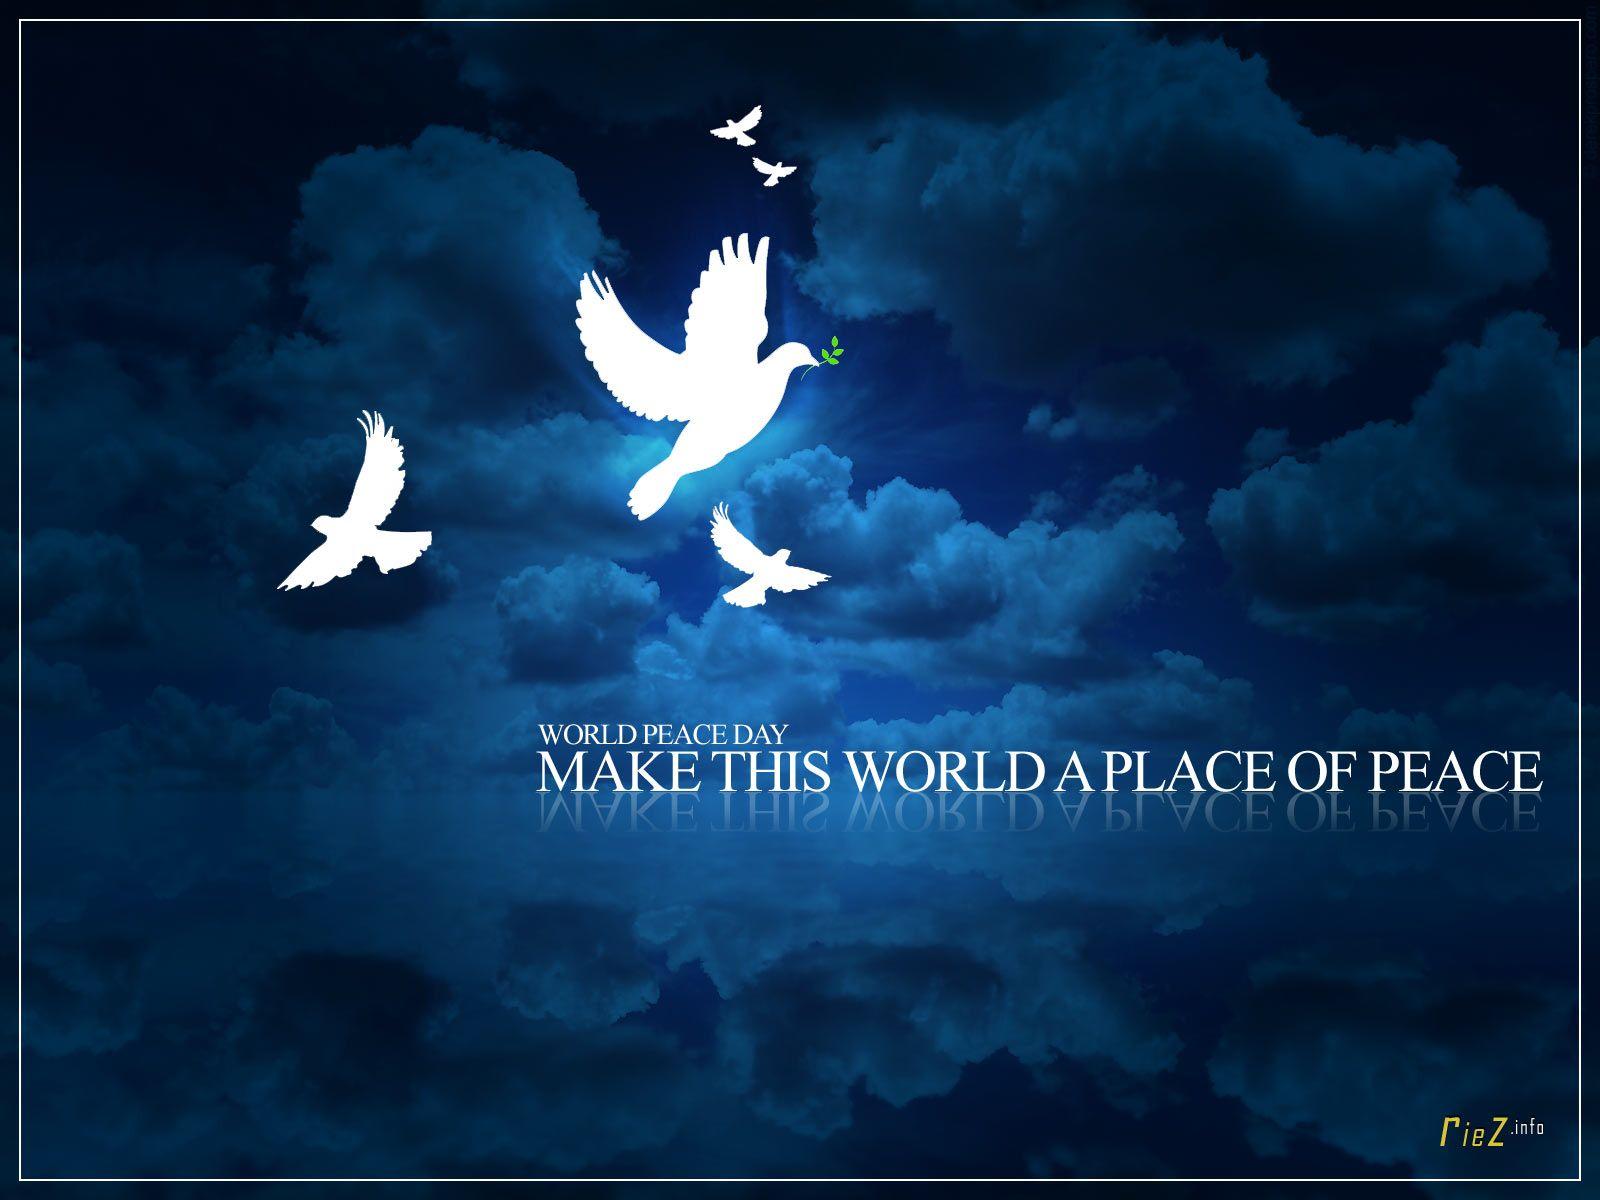 World Peace Wallpaper High Quality Sammy loves Pinterest com 1600x1200